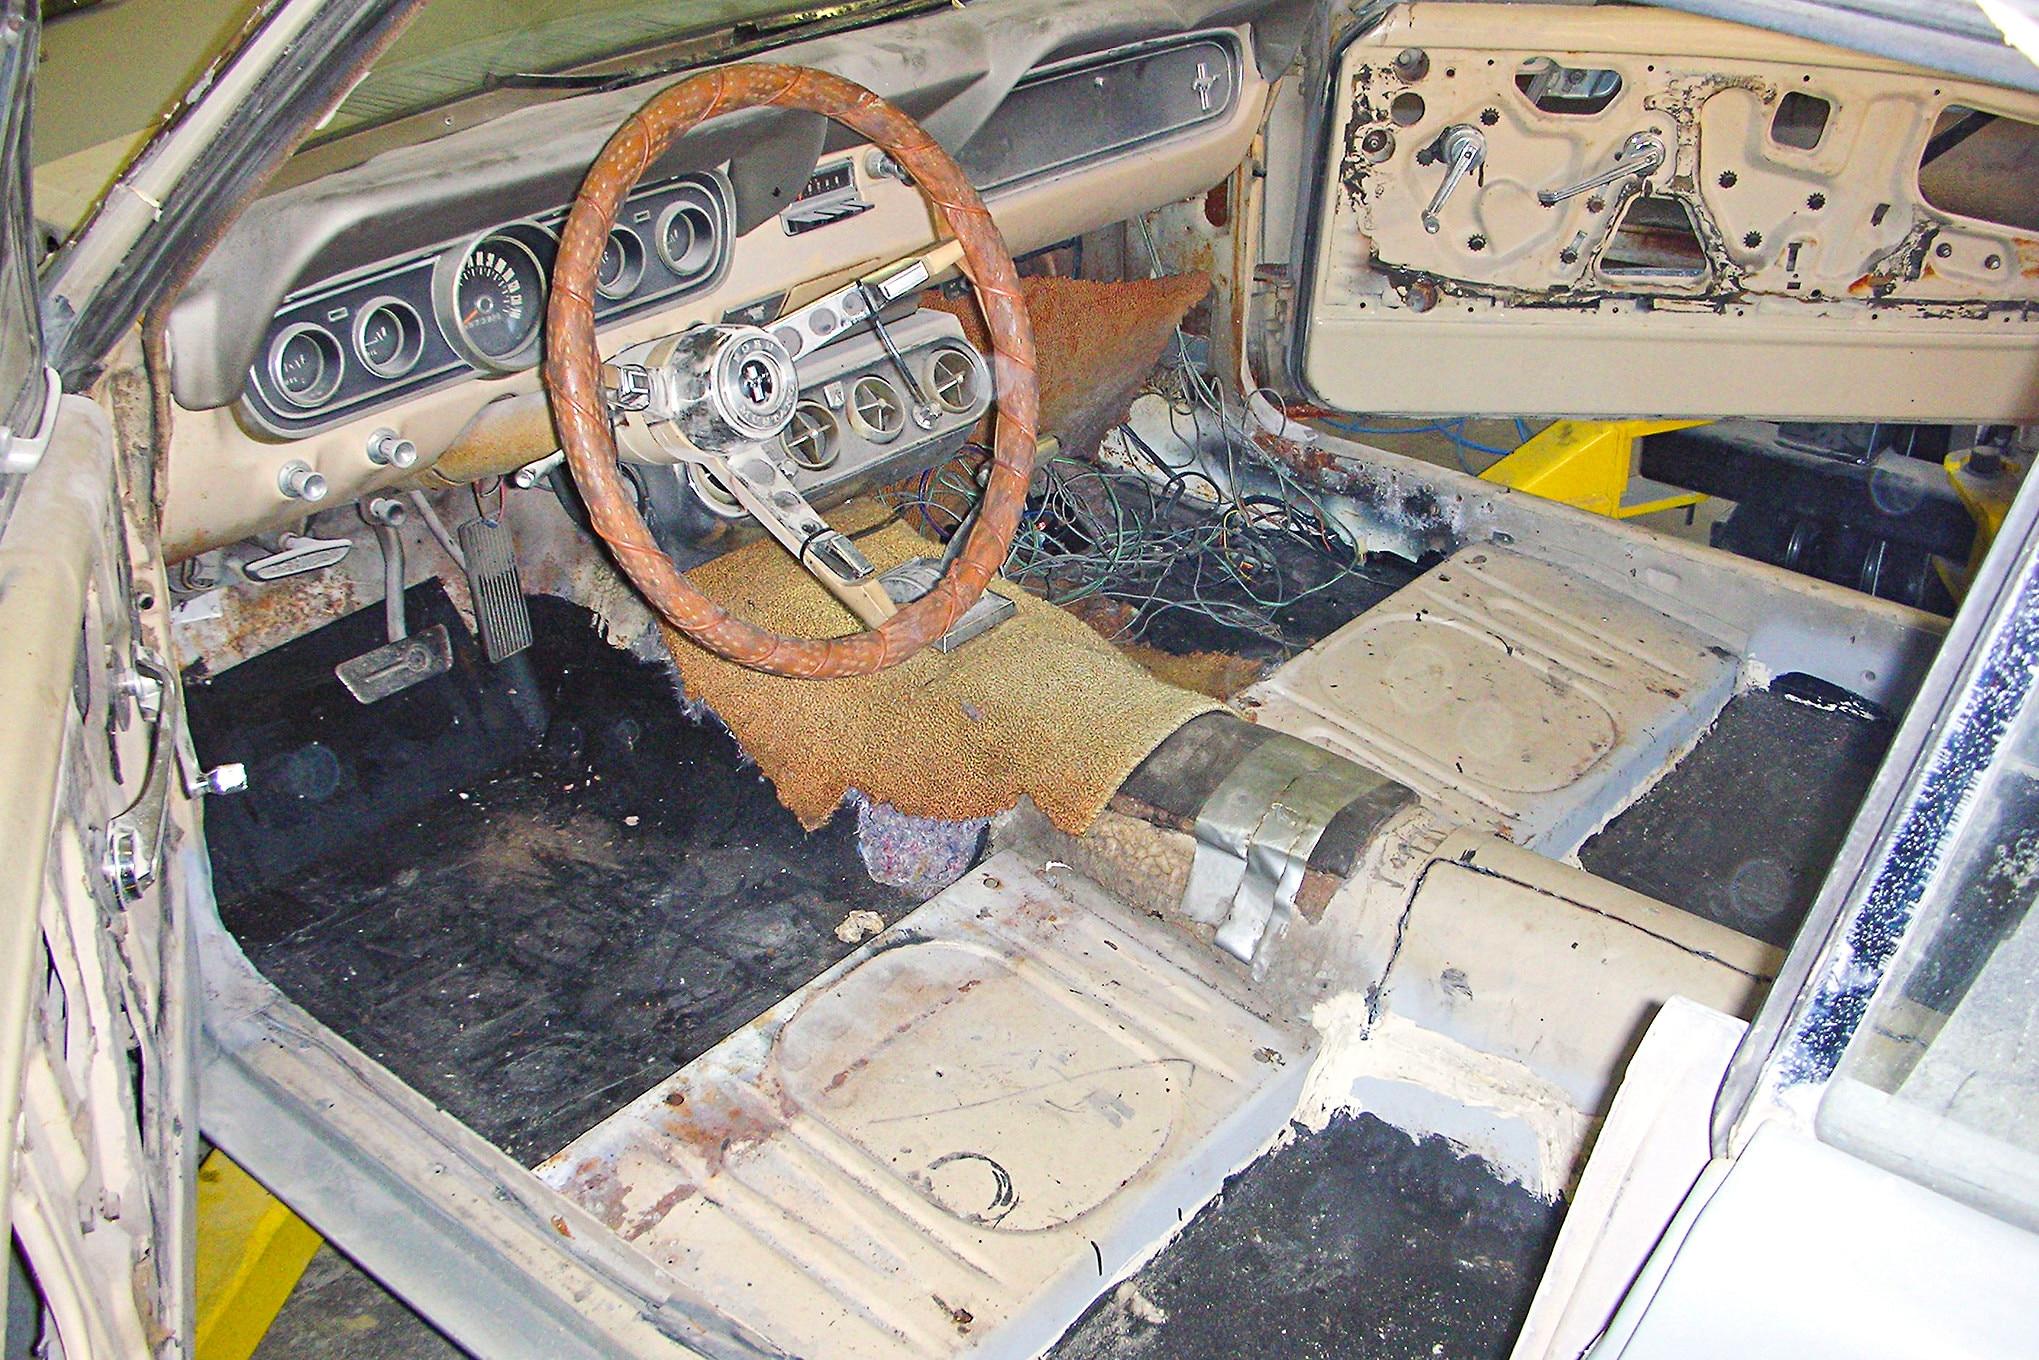 045 1966 Mustang Interior